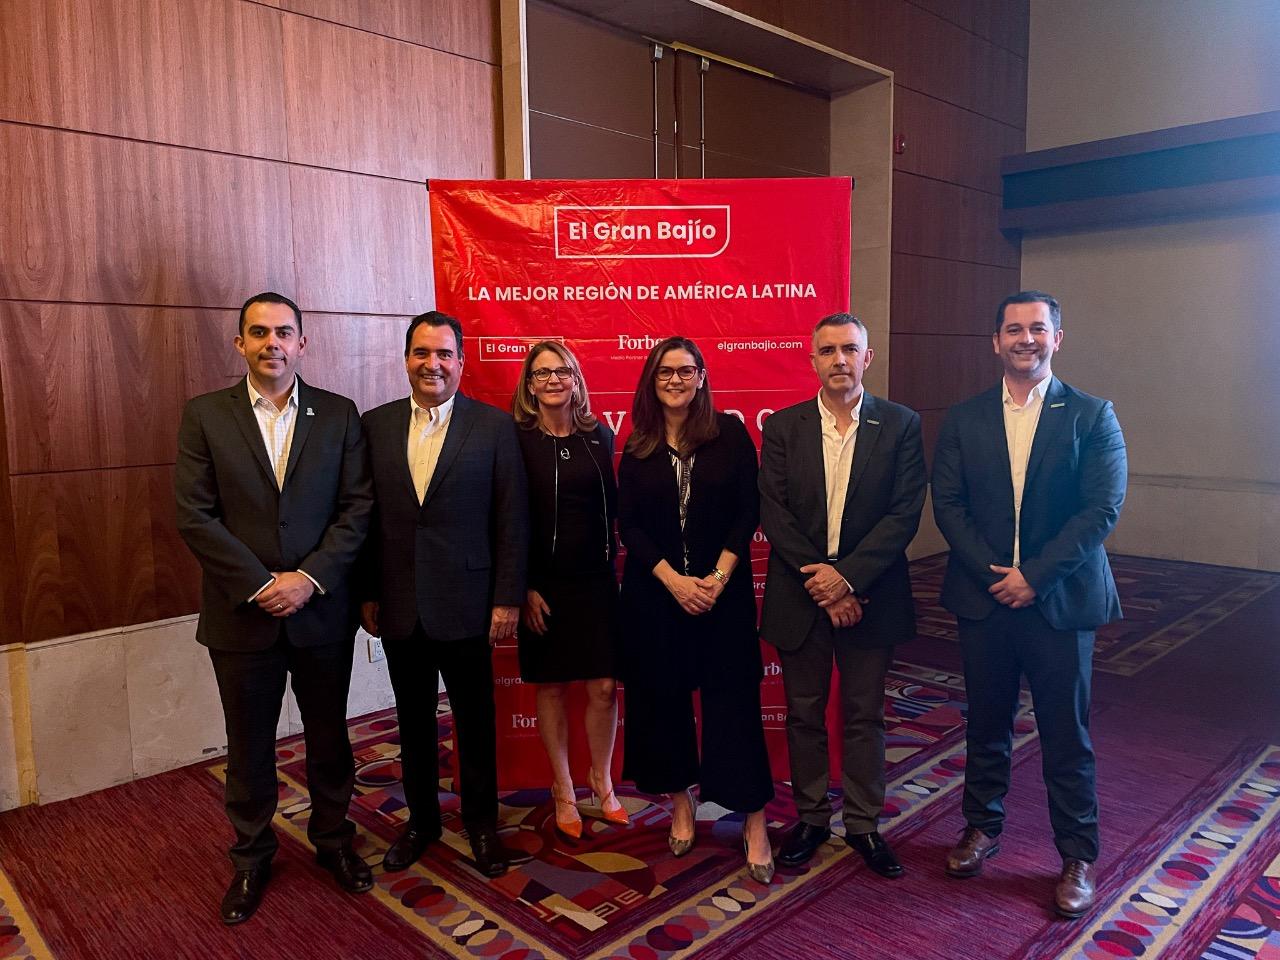 Enlace Forbes llega a Aguascalientes de la mano de El Gran Bajío